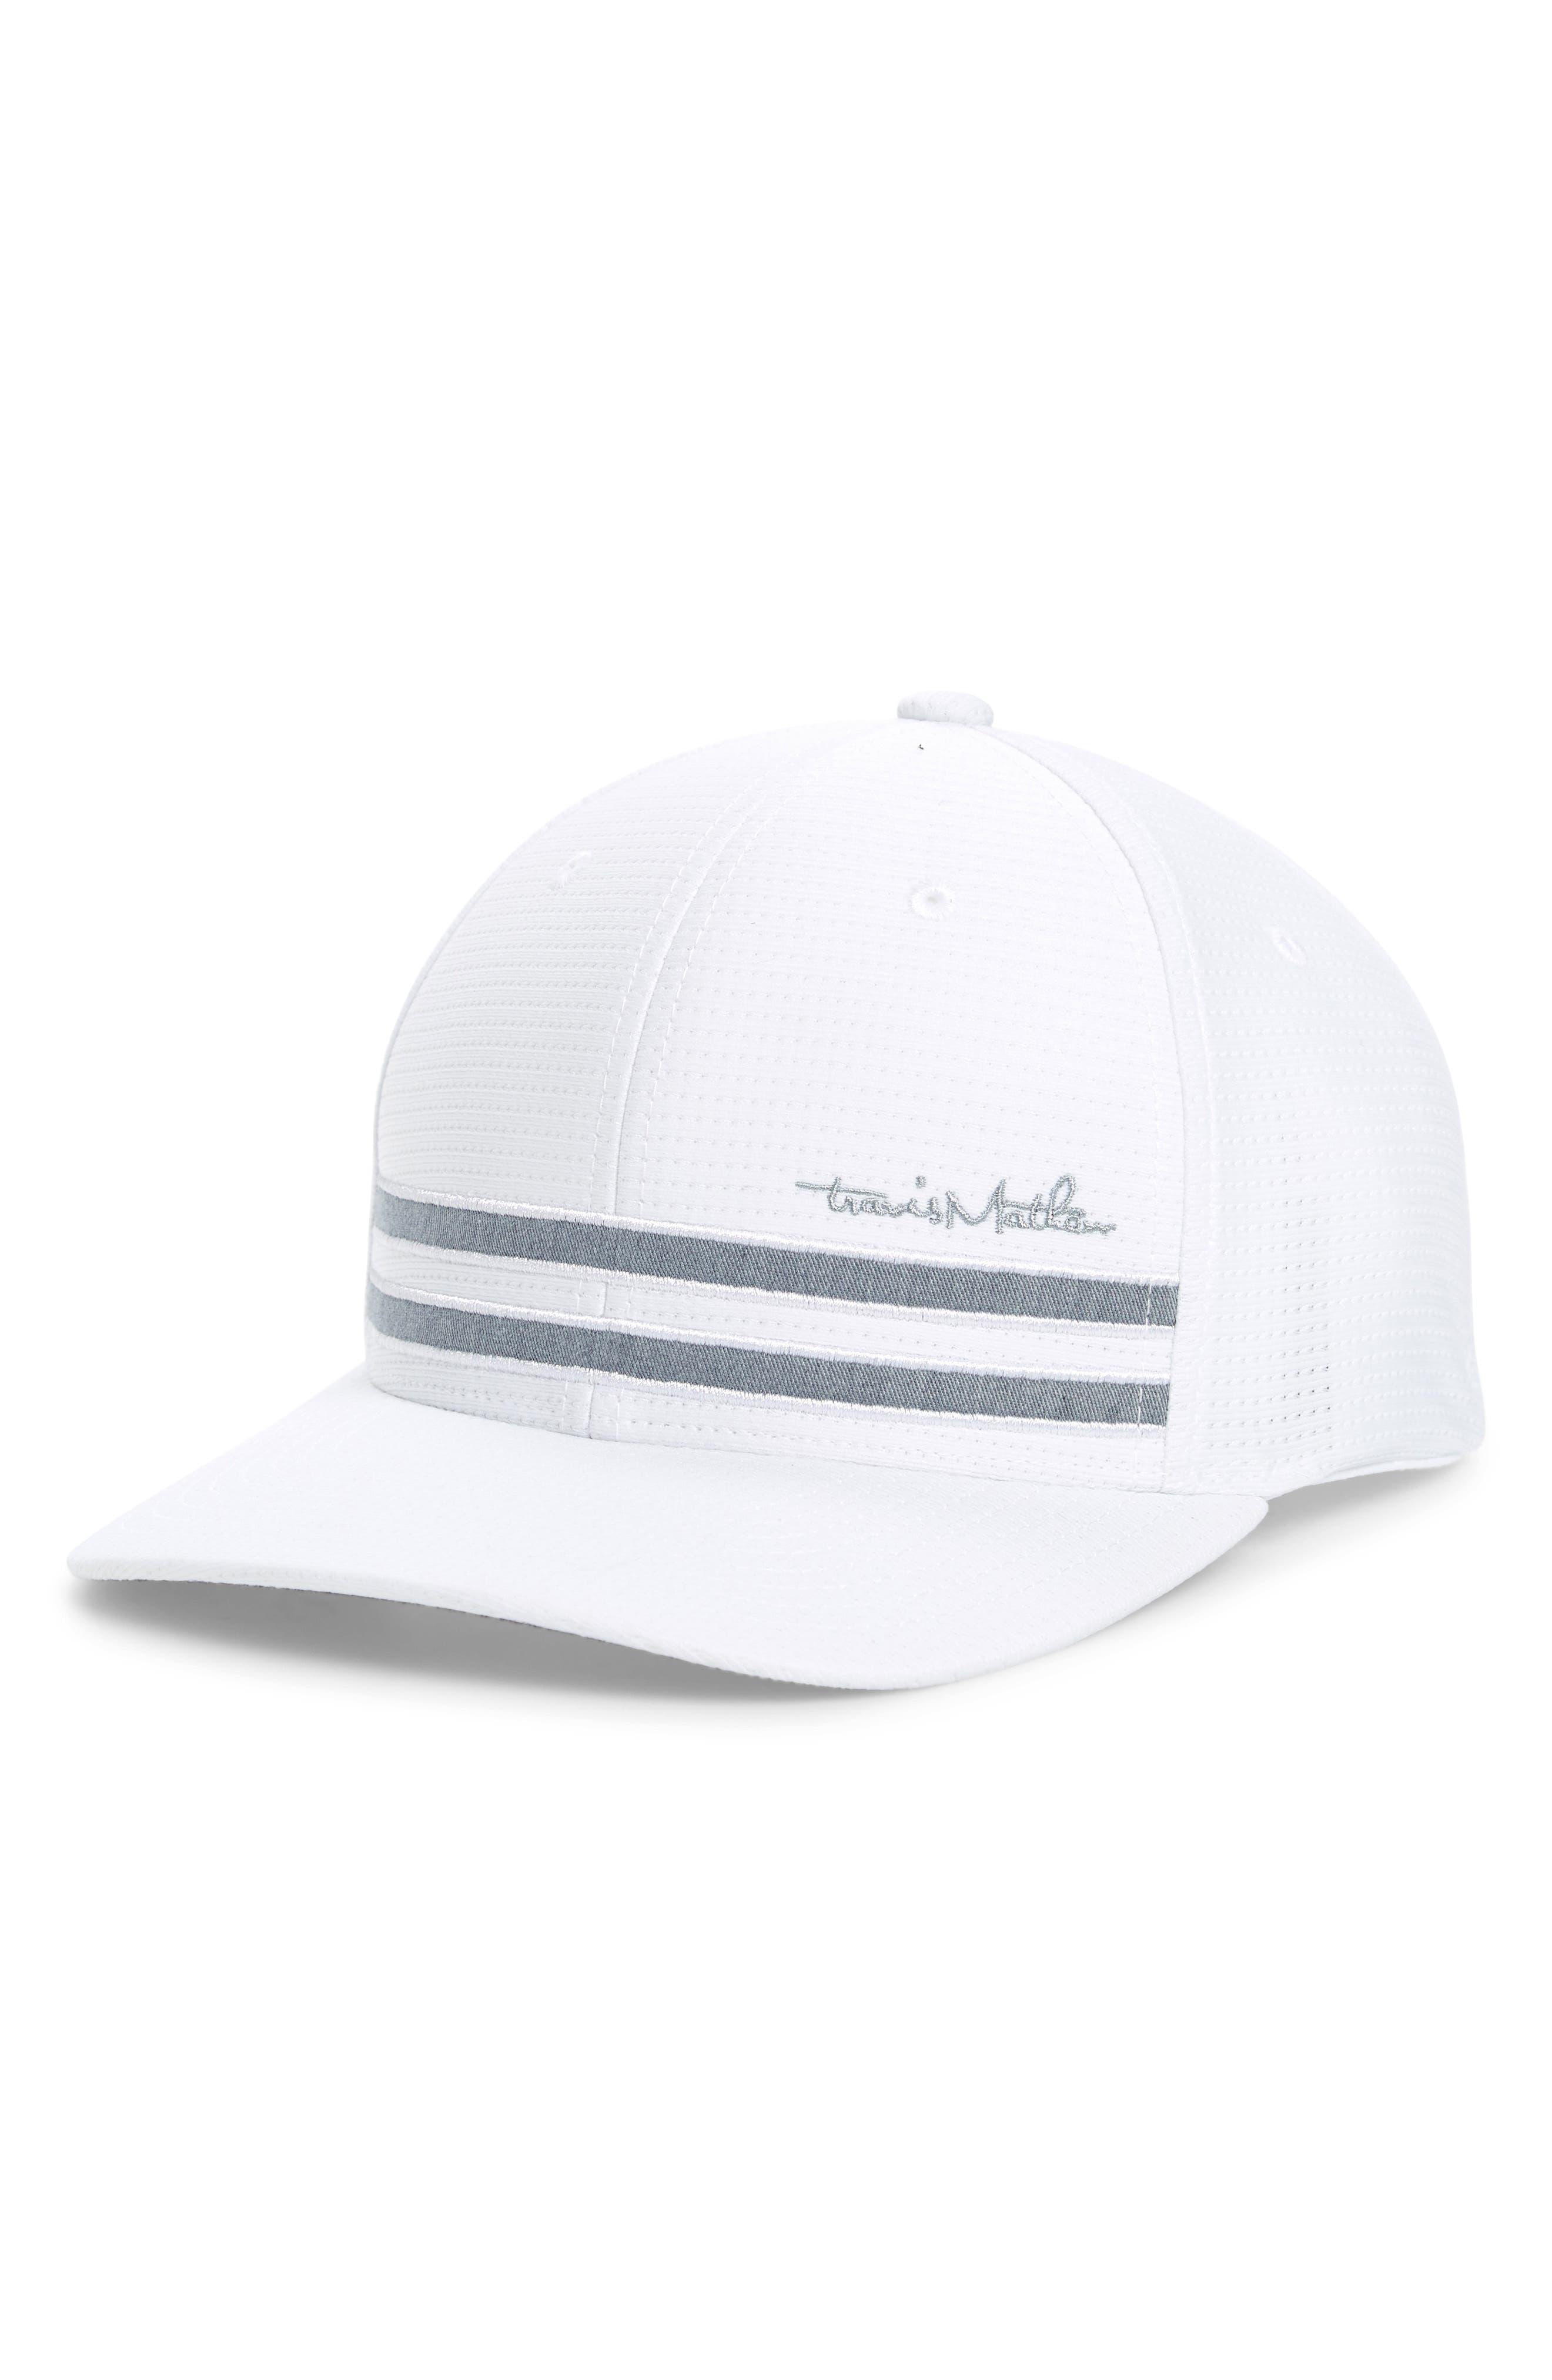 TRAVISMATHEW, Hout Golfer Cap, Main thumbnail 1, color, 100